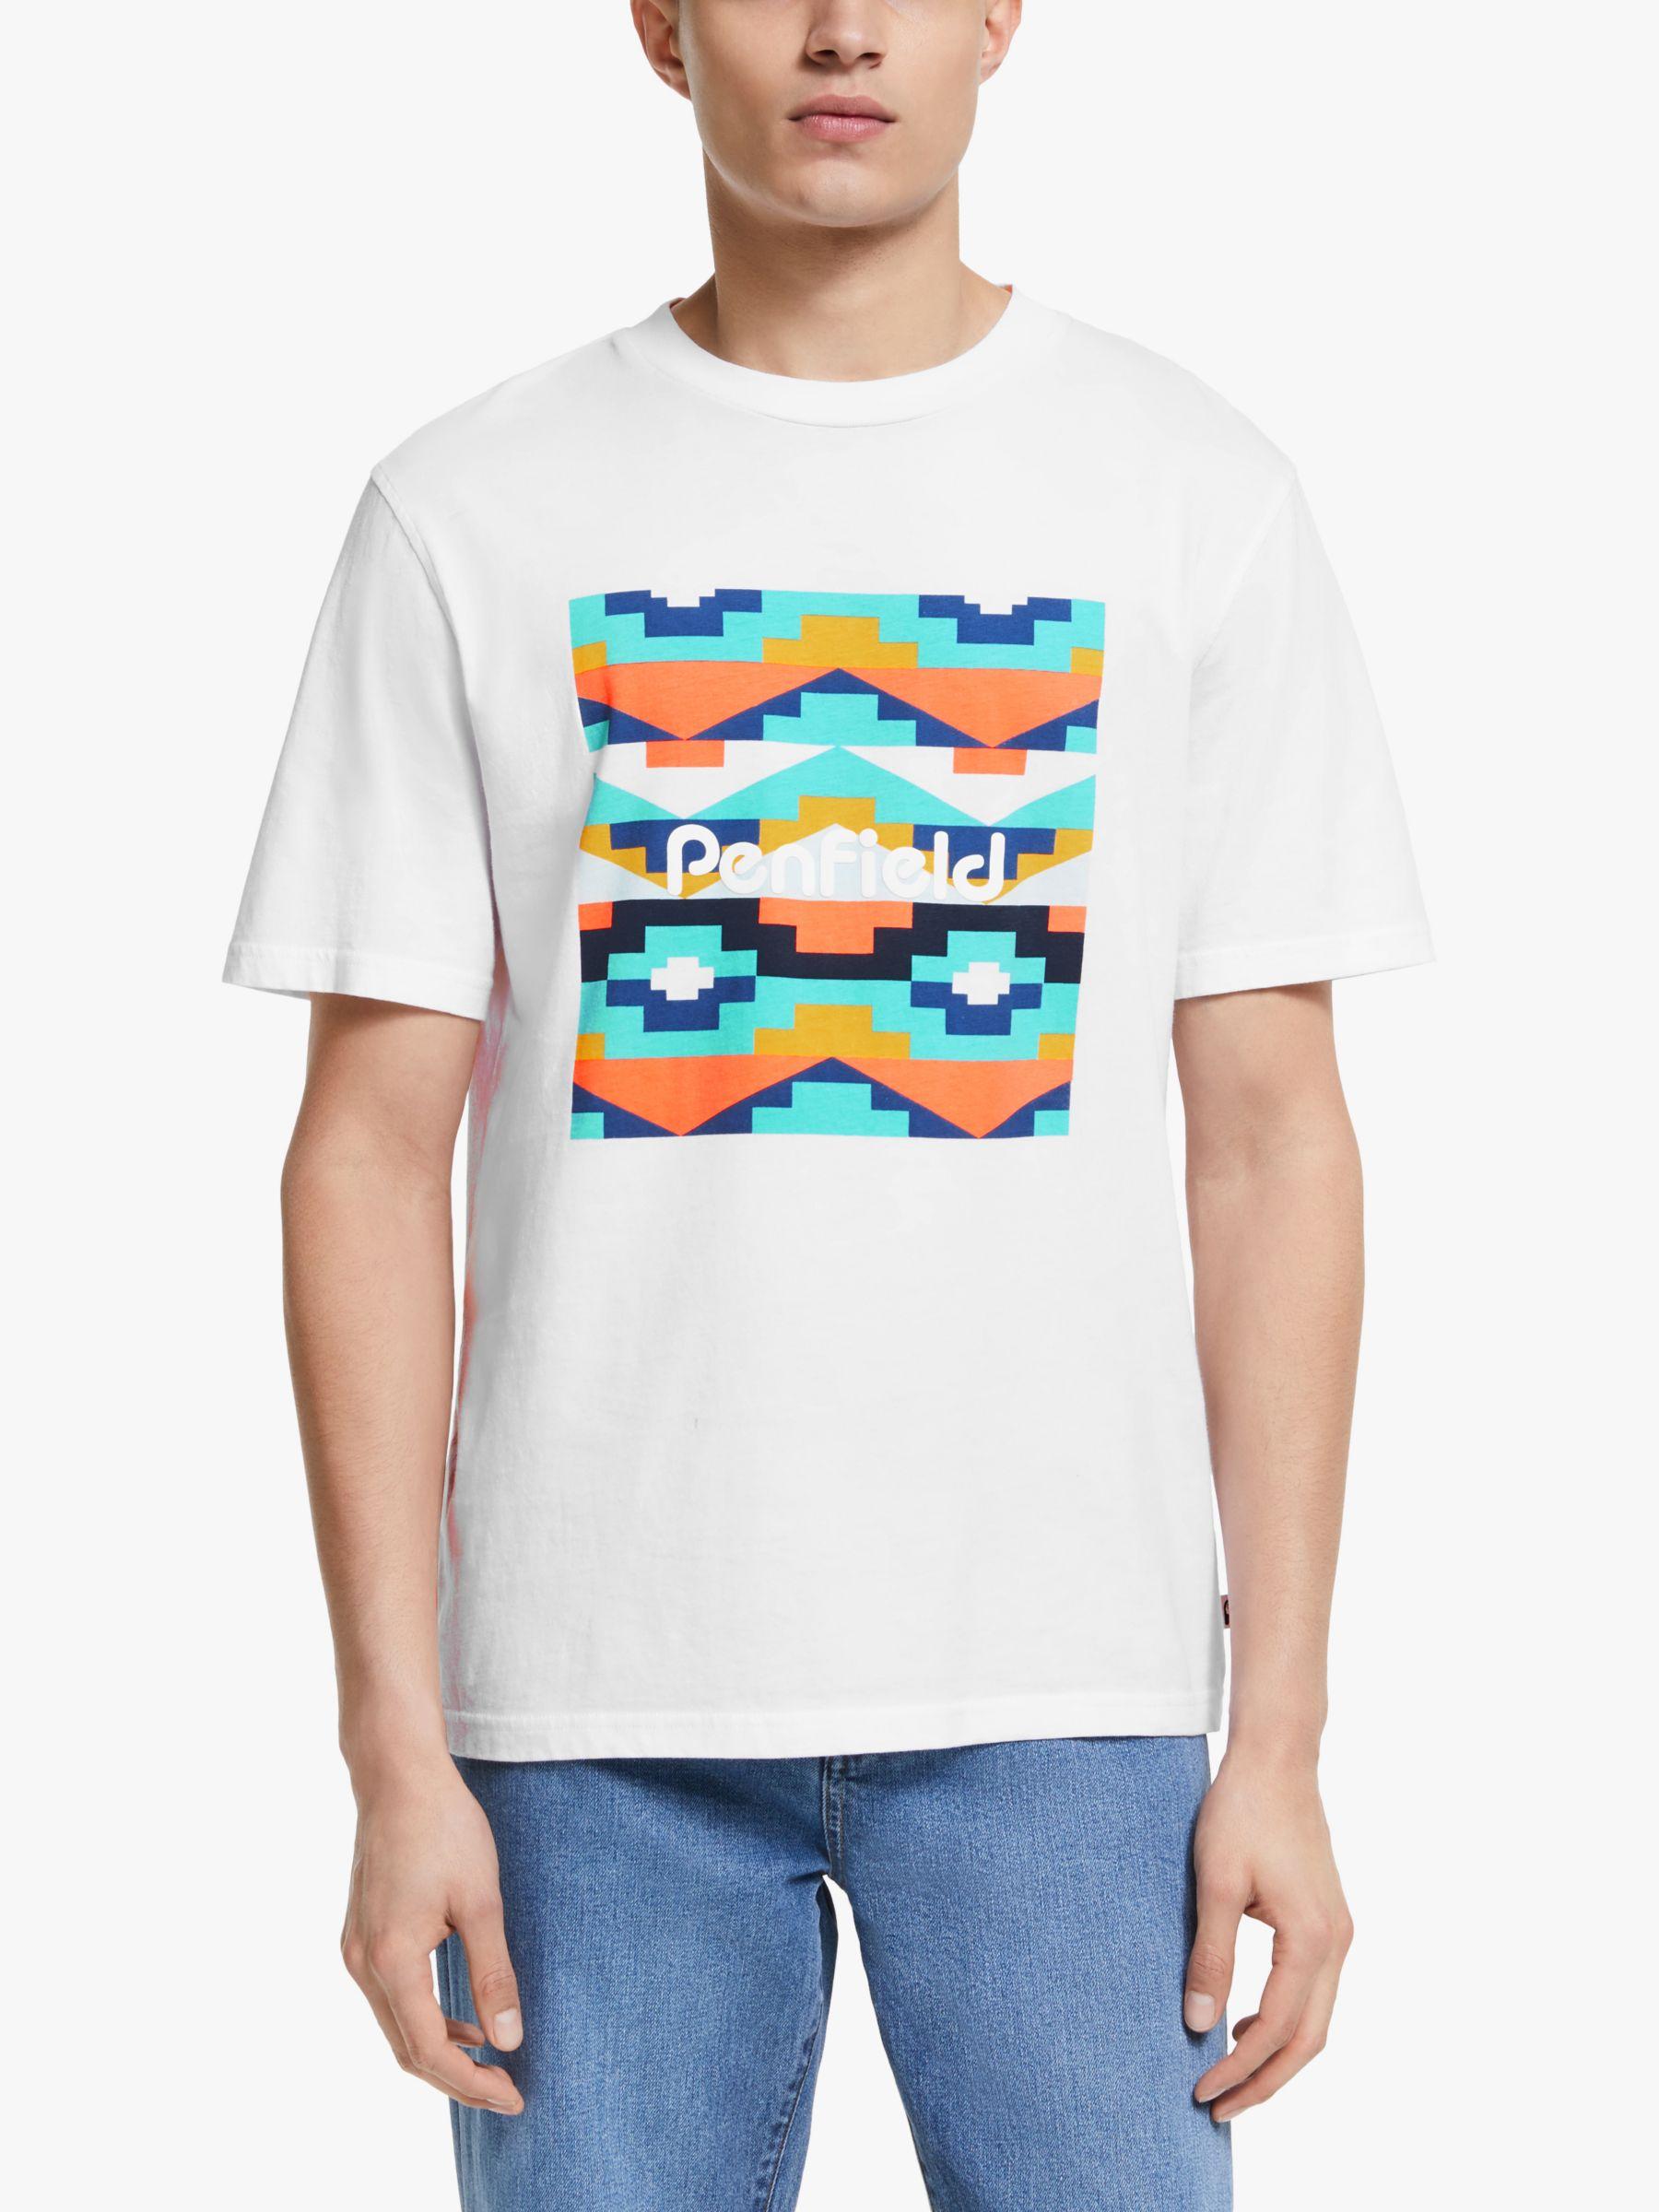 Penfield Penfield Sandtoft Print T-Shirt, White